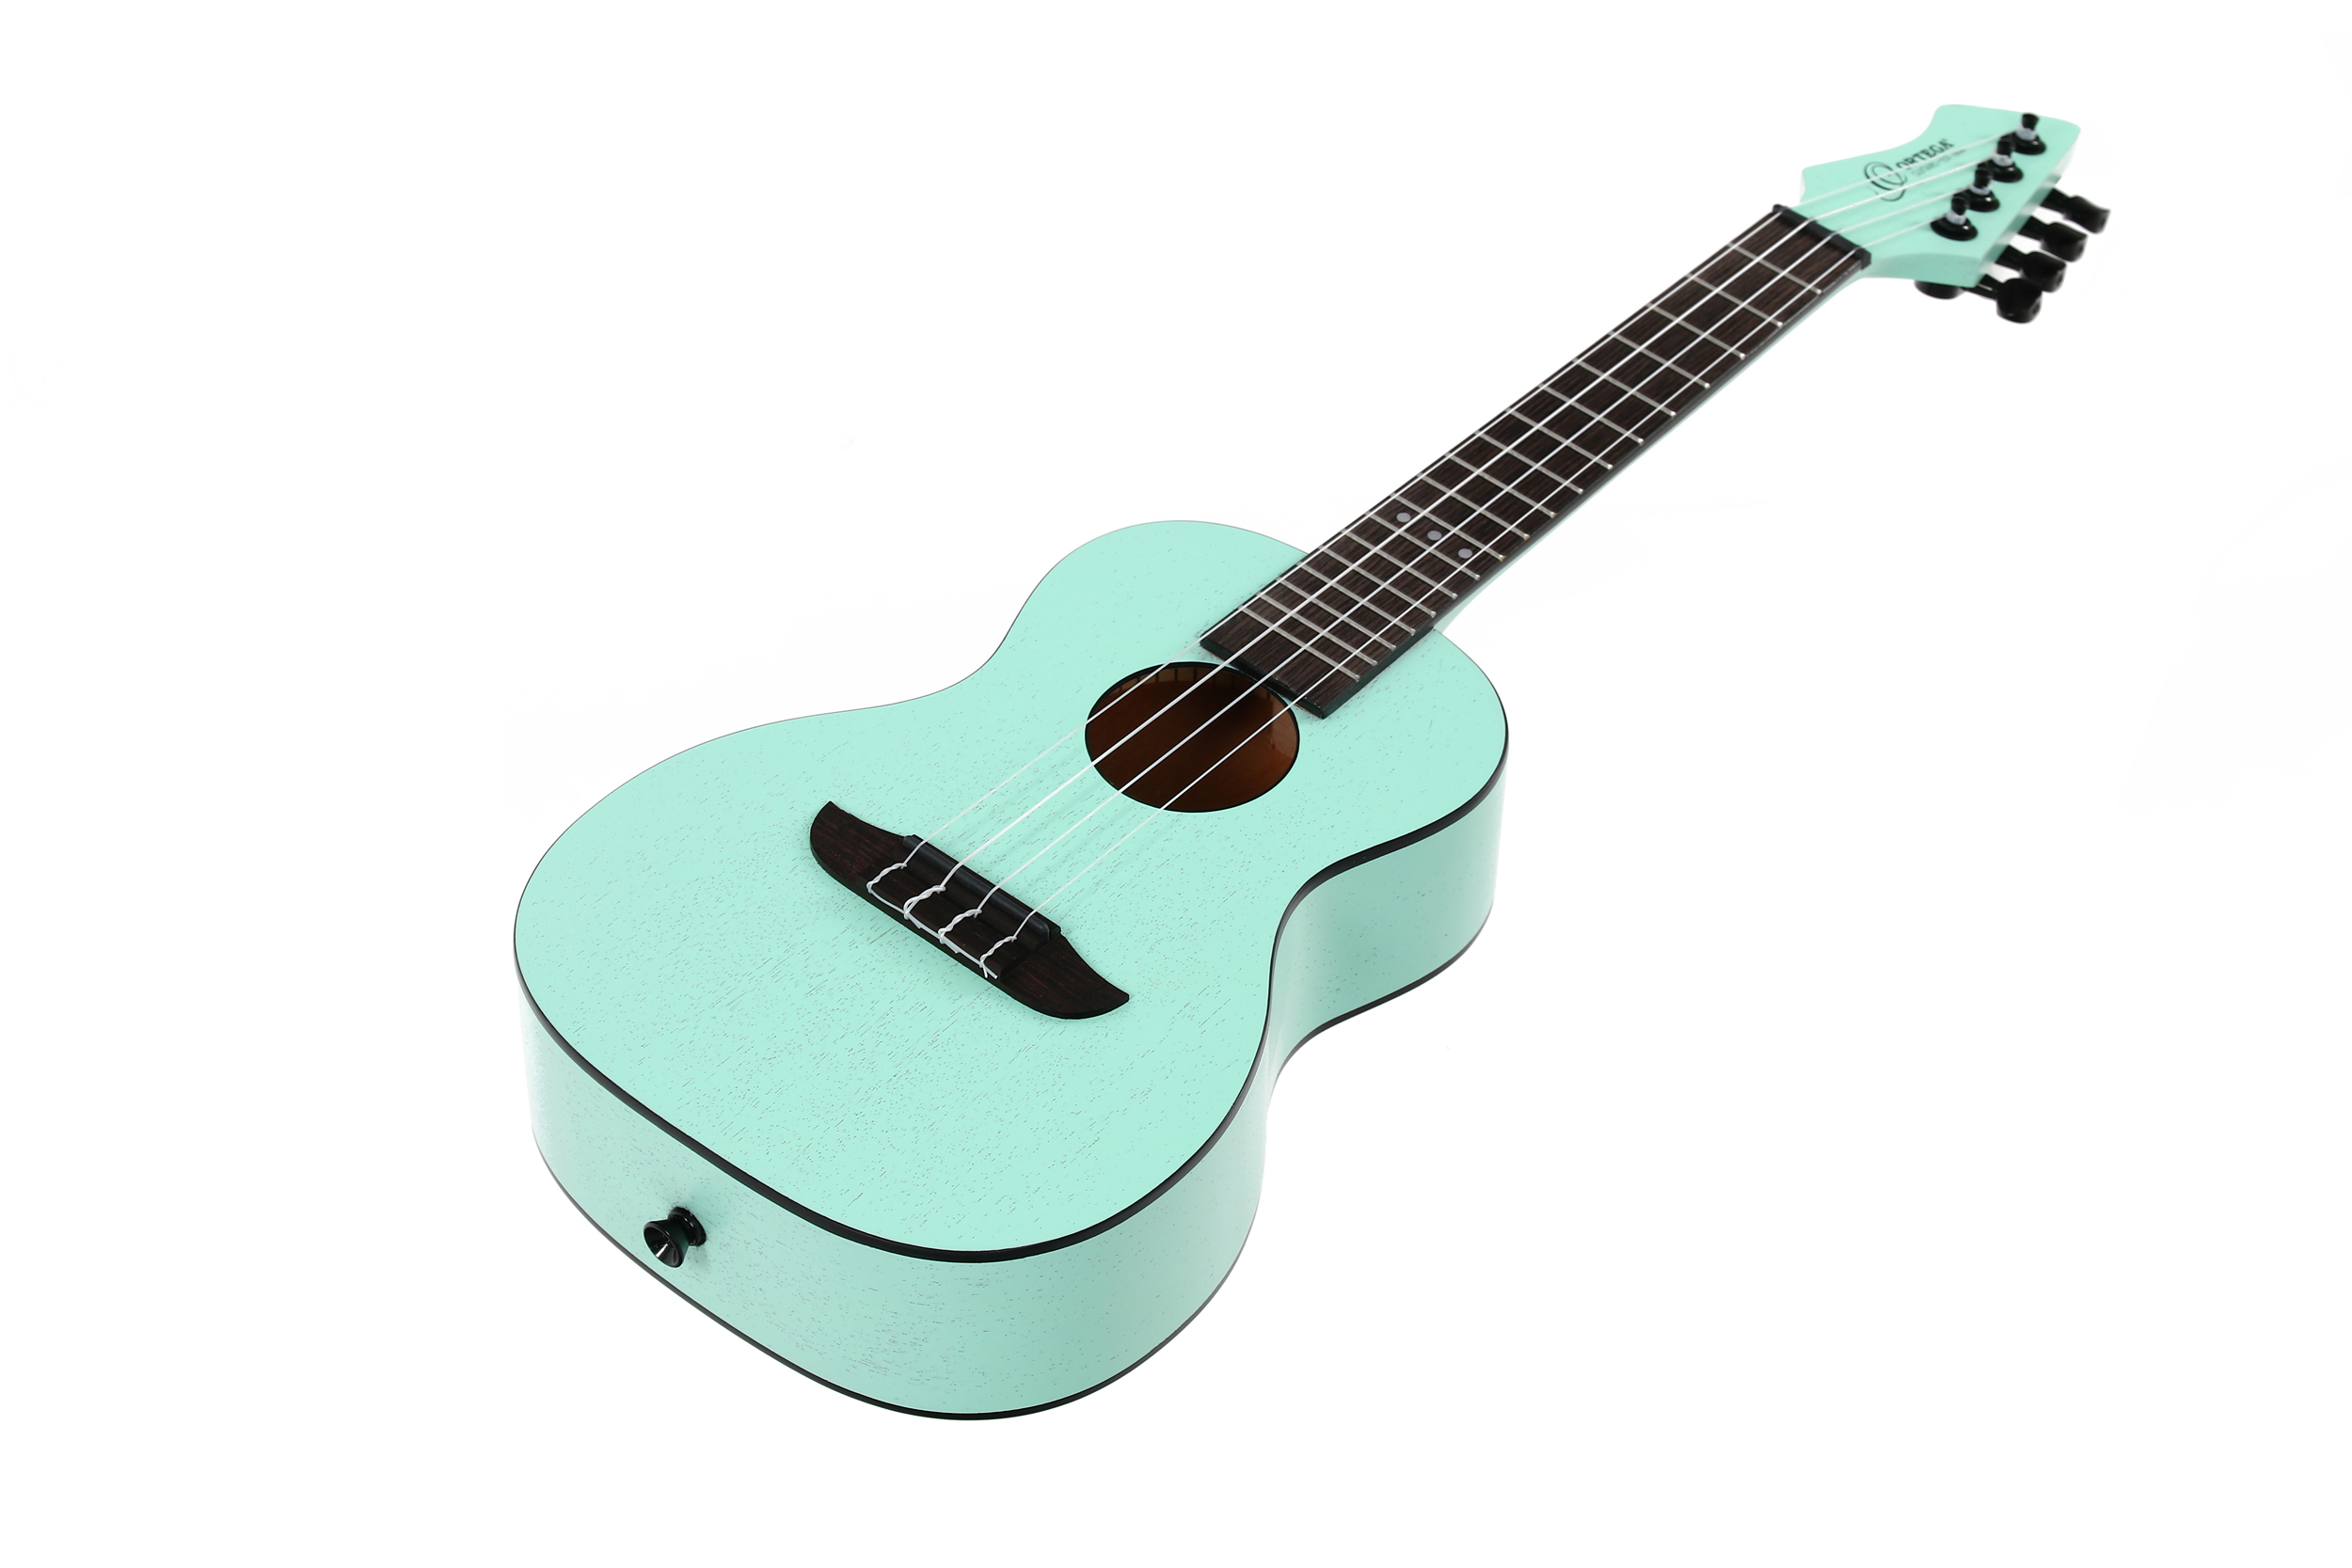 Ortega_RUHZ-SFG_Ukulelen_8_Guitar Shop Corda